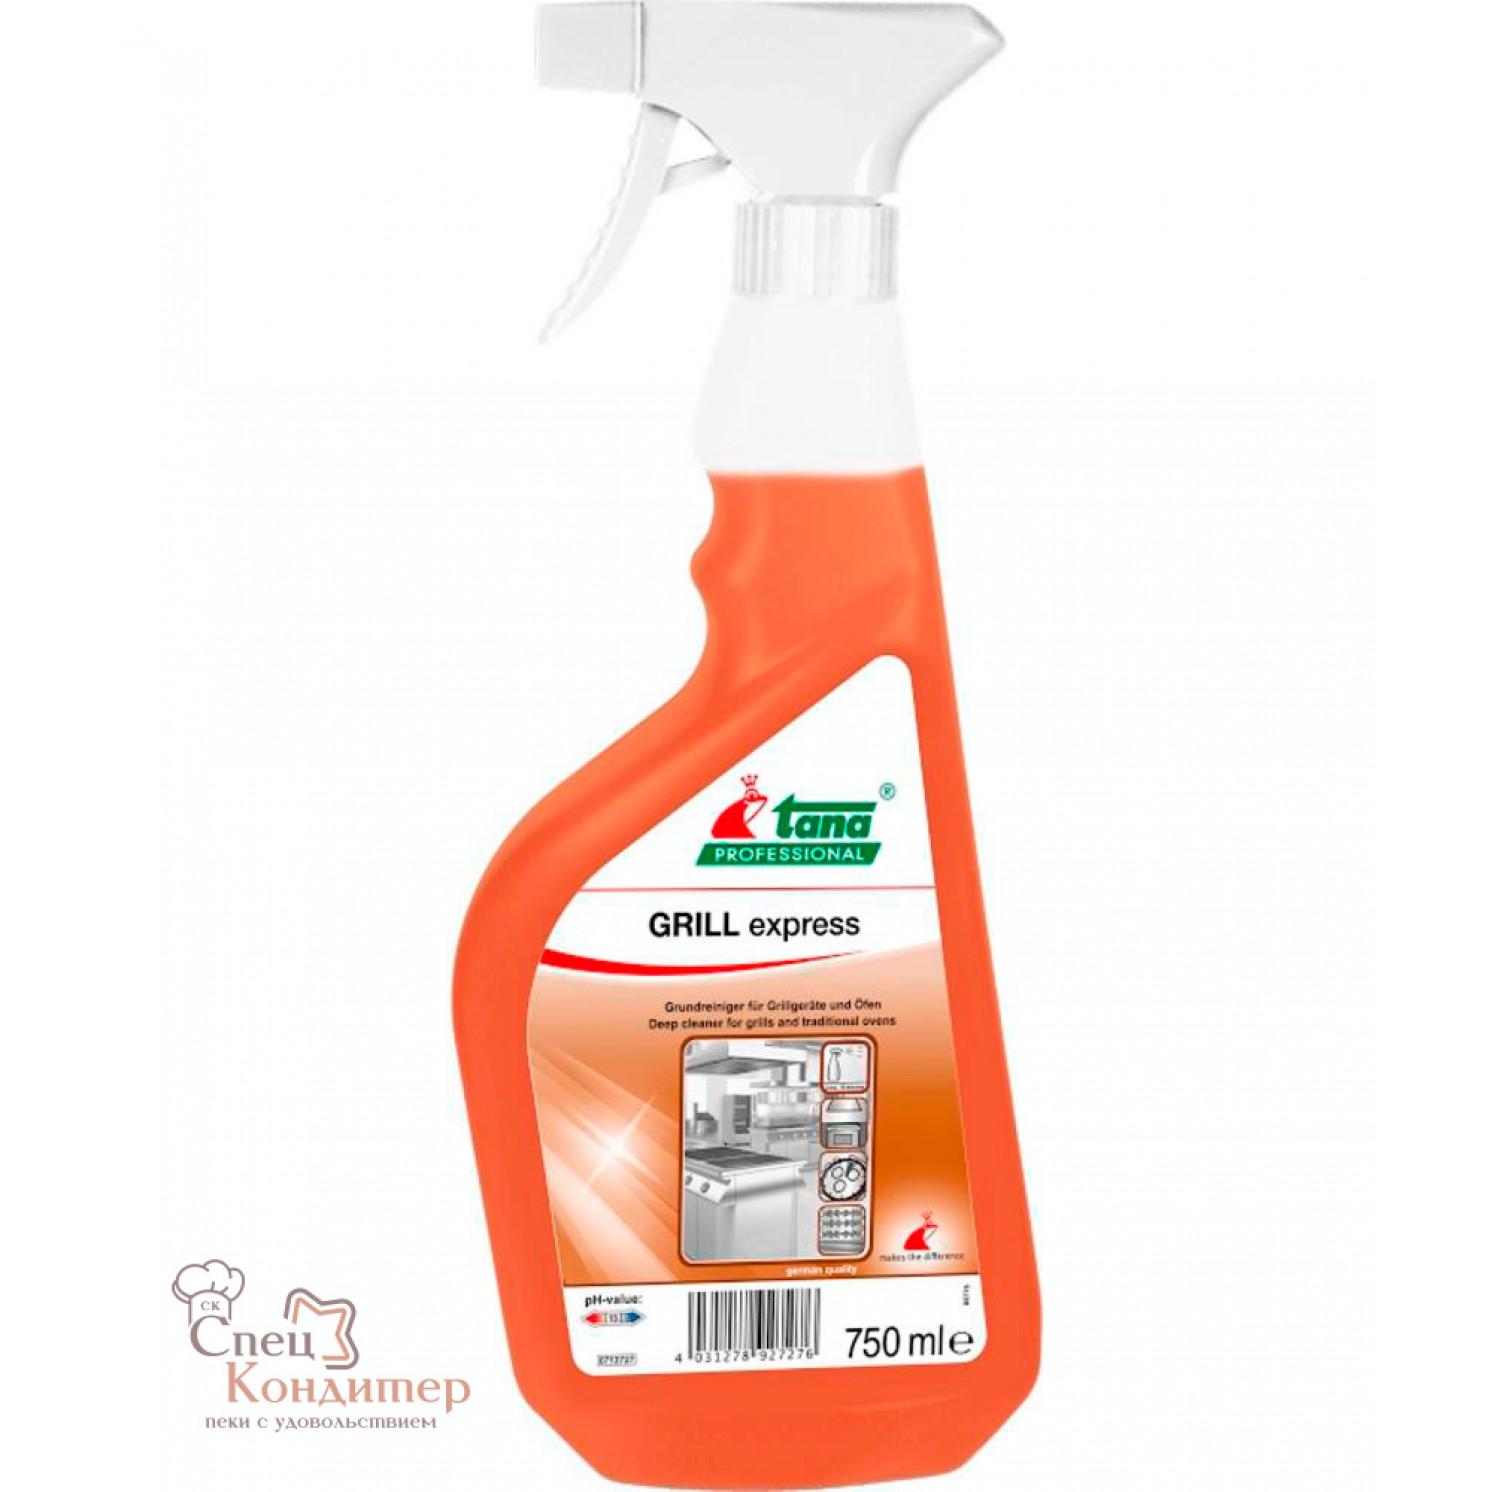 Tana GRILL express Средство для очистки печей, грилей и т.д. 750мл